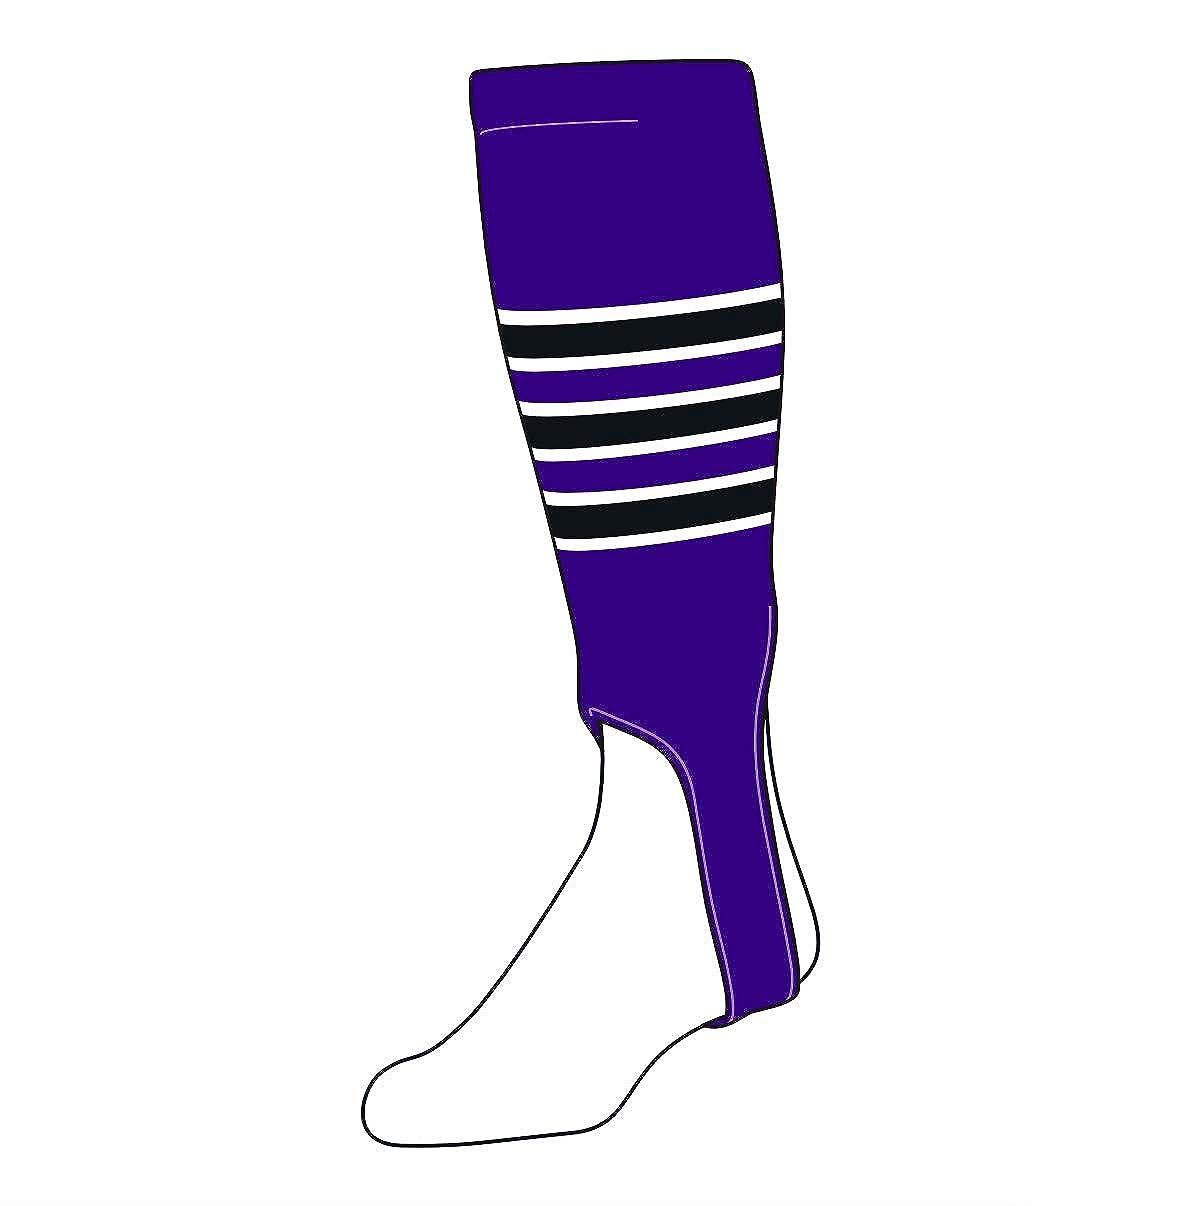 TCK サイズ: Socks SOCKSHOSIERY メンズ US サイズ: TCK Large B07NKN77B3 19 inch (16+ years) B07NKN77B3, 最愛:69b71033 --- cgt-tbc.fr